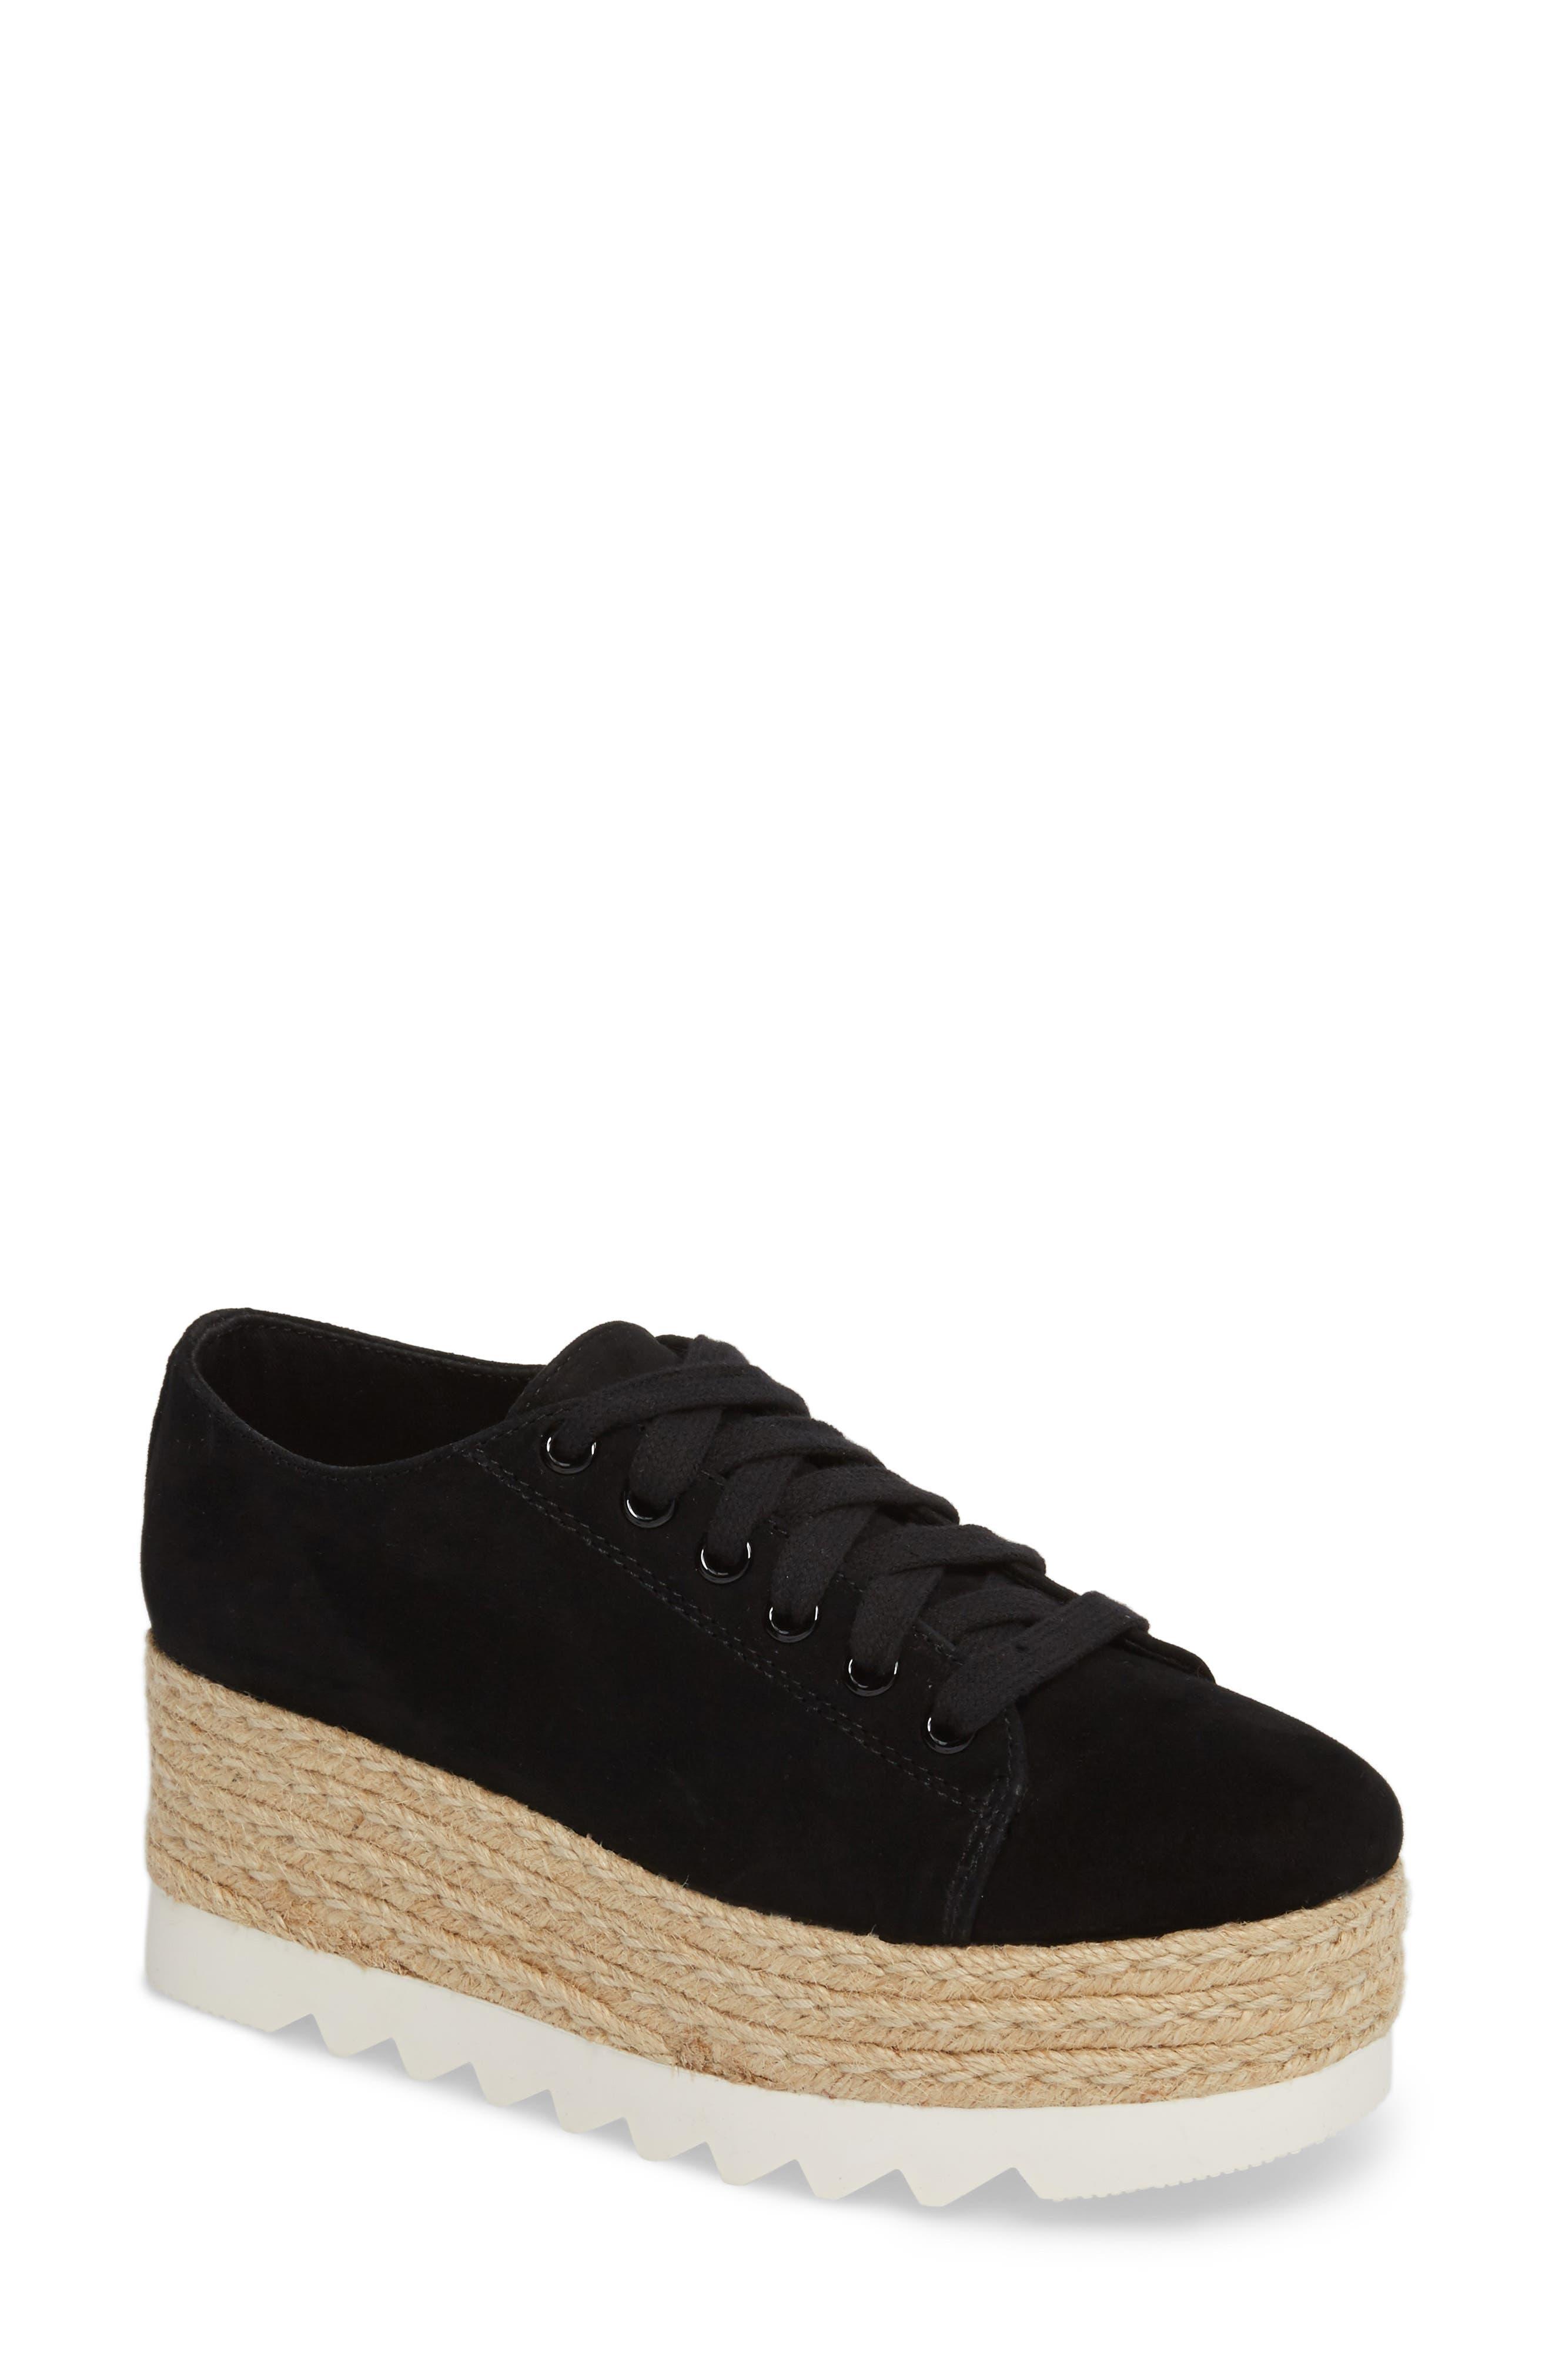 Karma Espadrille Platform Sneaker,                             Main thumbnail 1, color,                             BLACK SUED